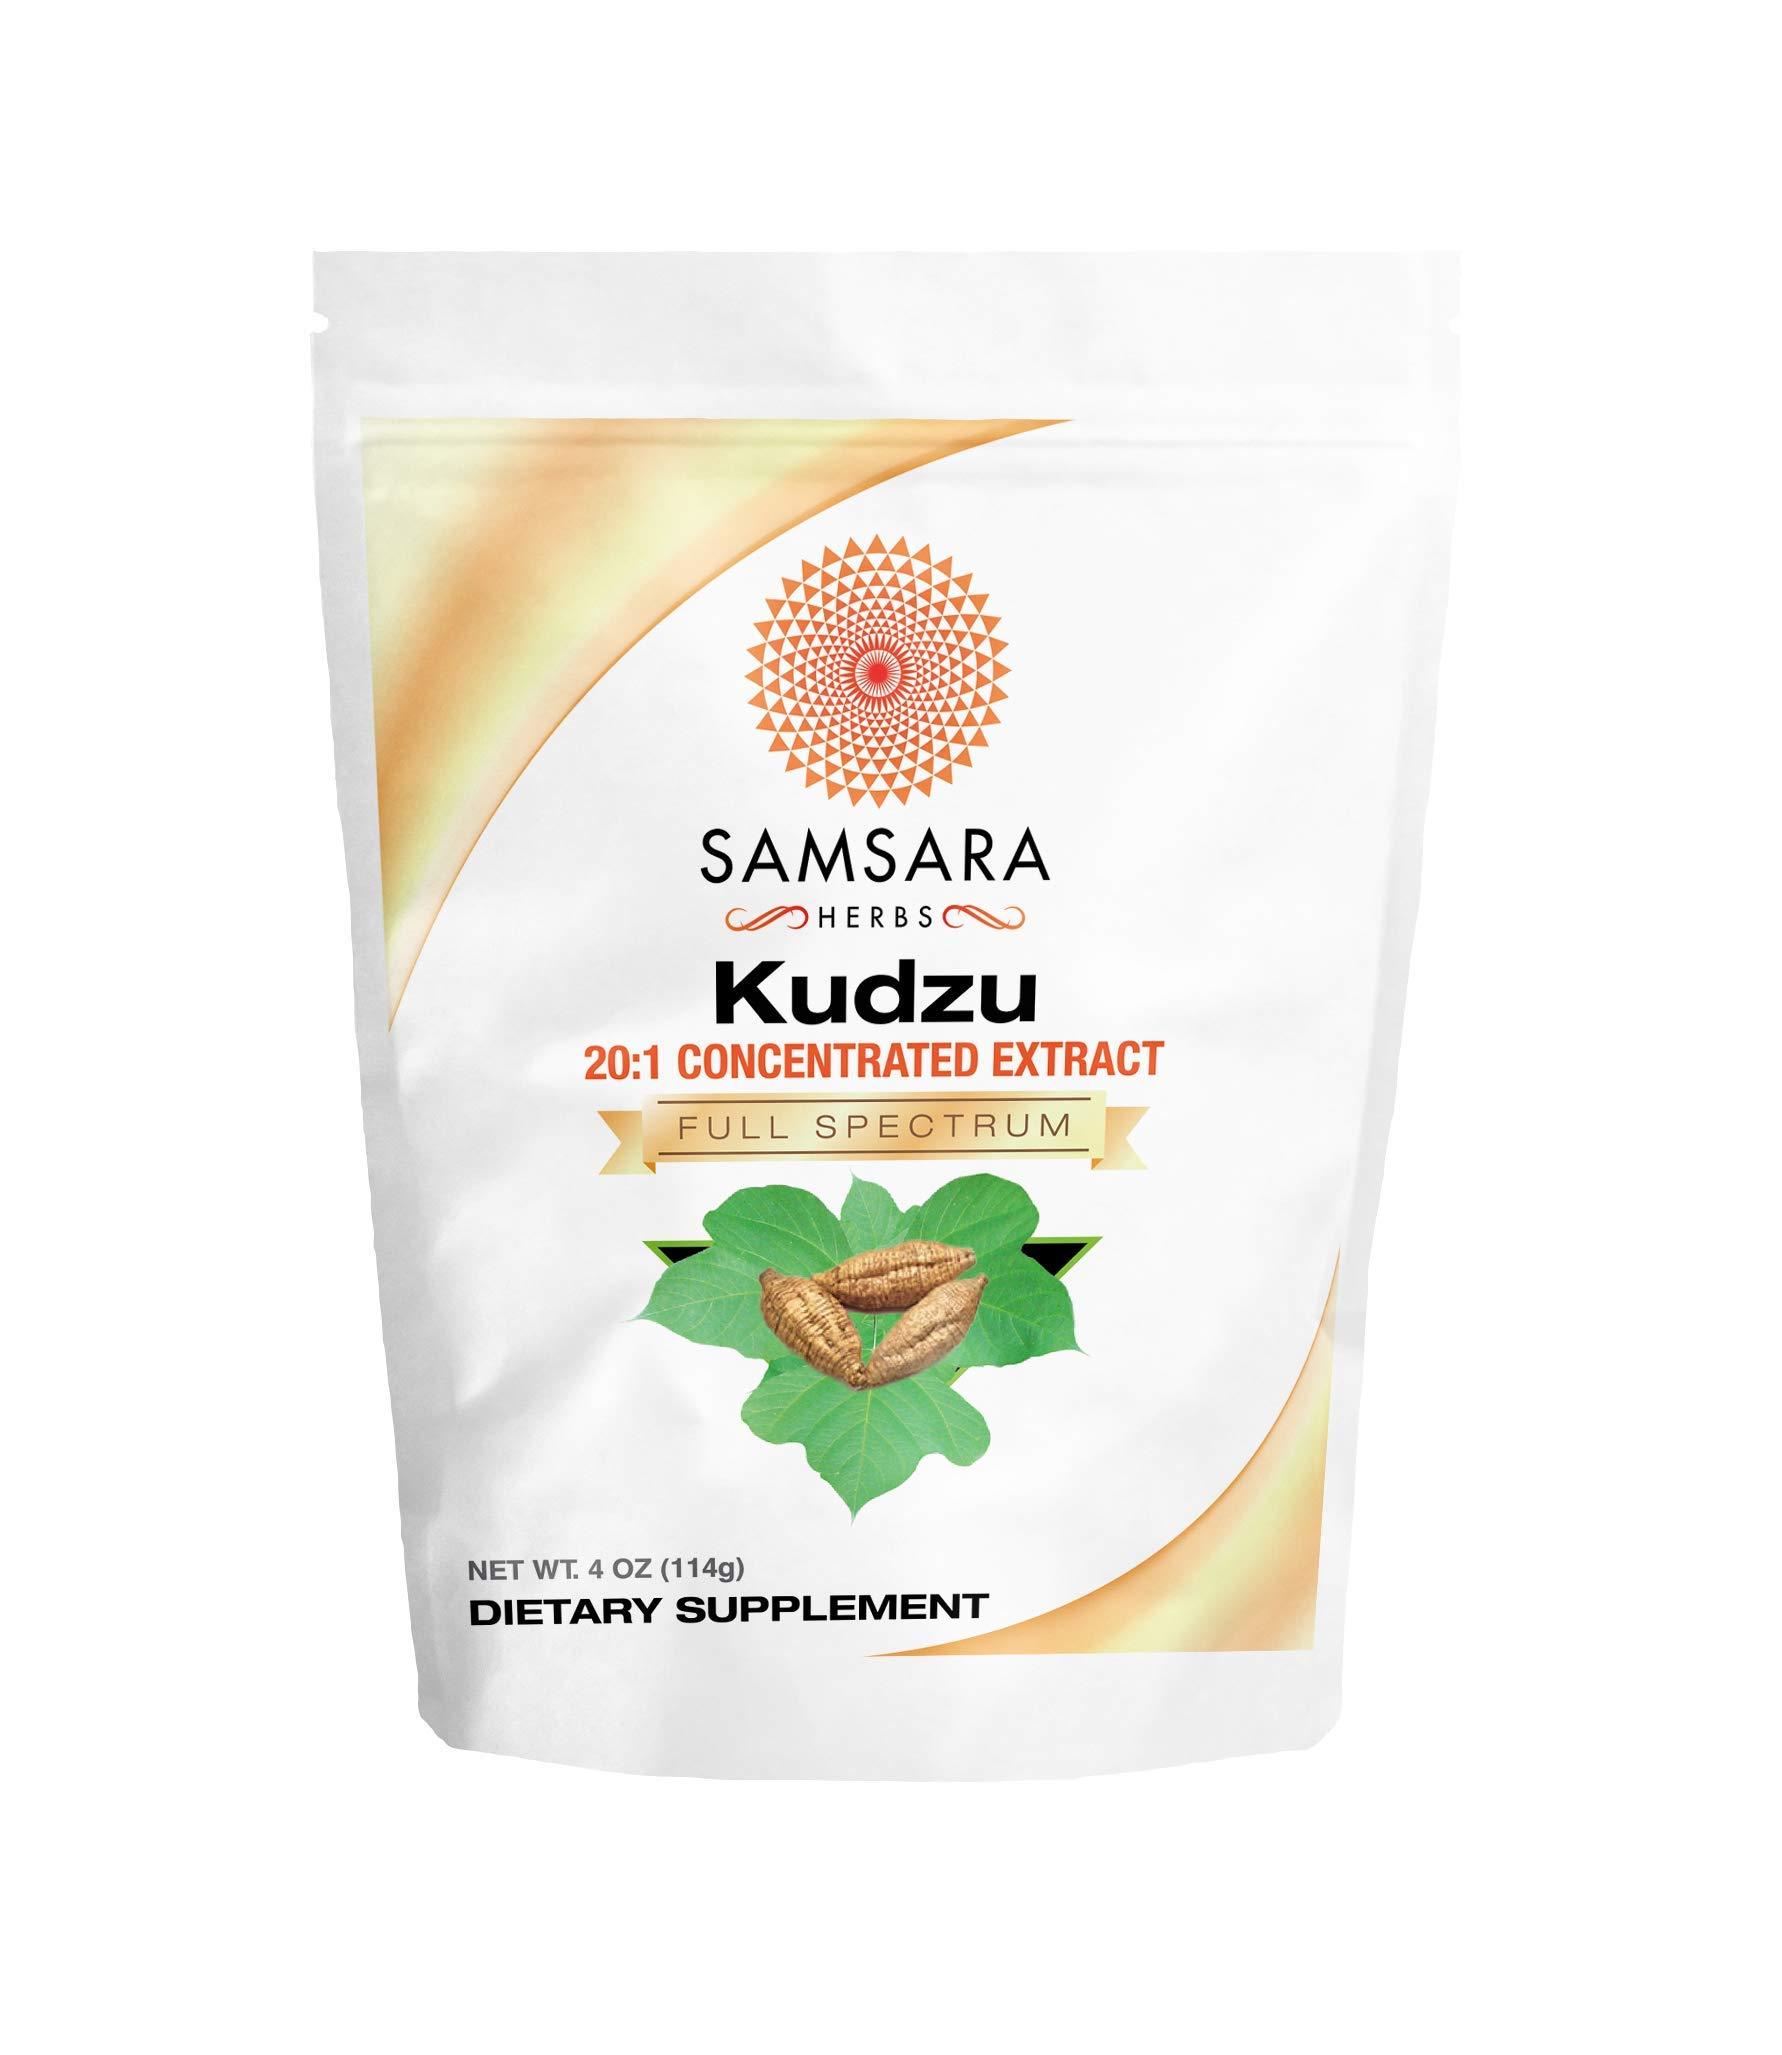 Samsara Herbs Kudzu Root Extract Powder (4oz / 114g) 20:1 Concentrated Extract